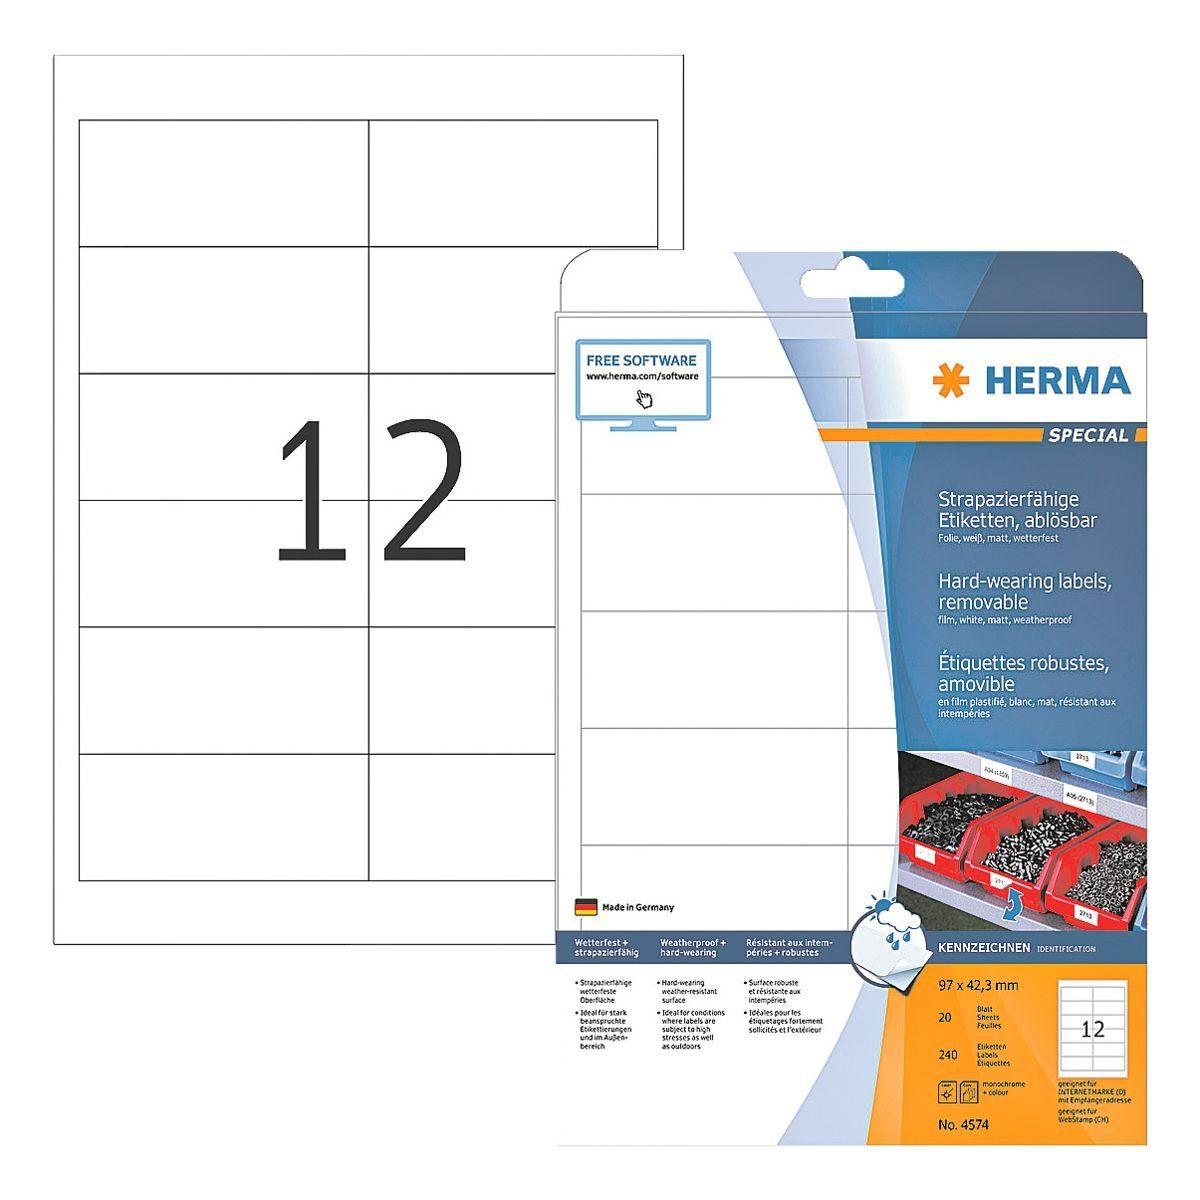 HERMA Outdoor Folien-Etiketten 240 Stück »Special«